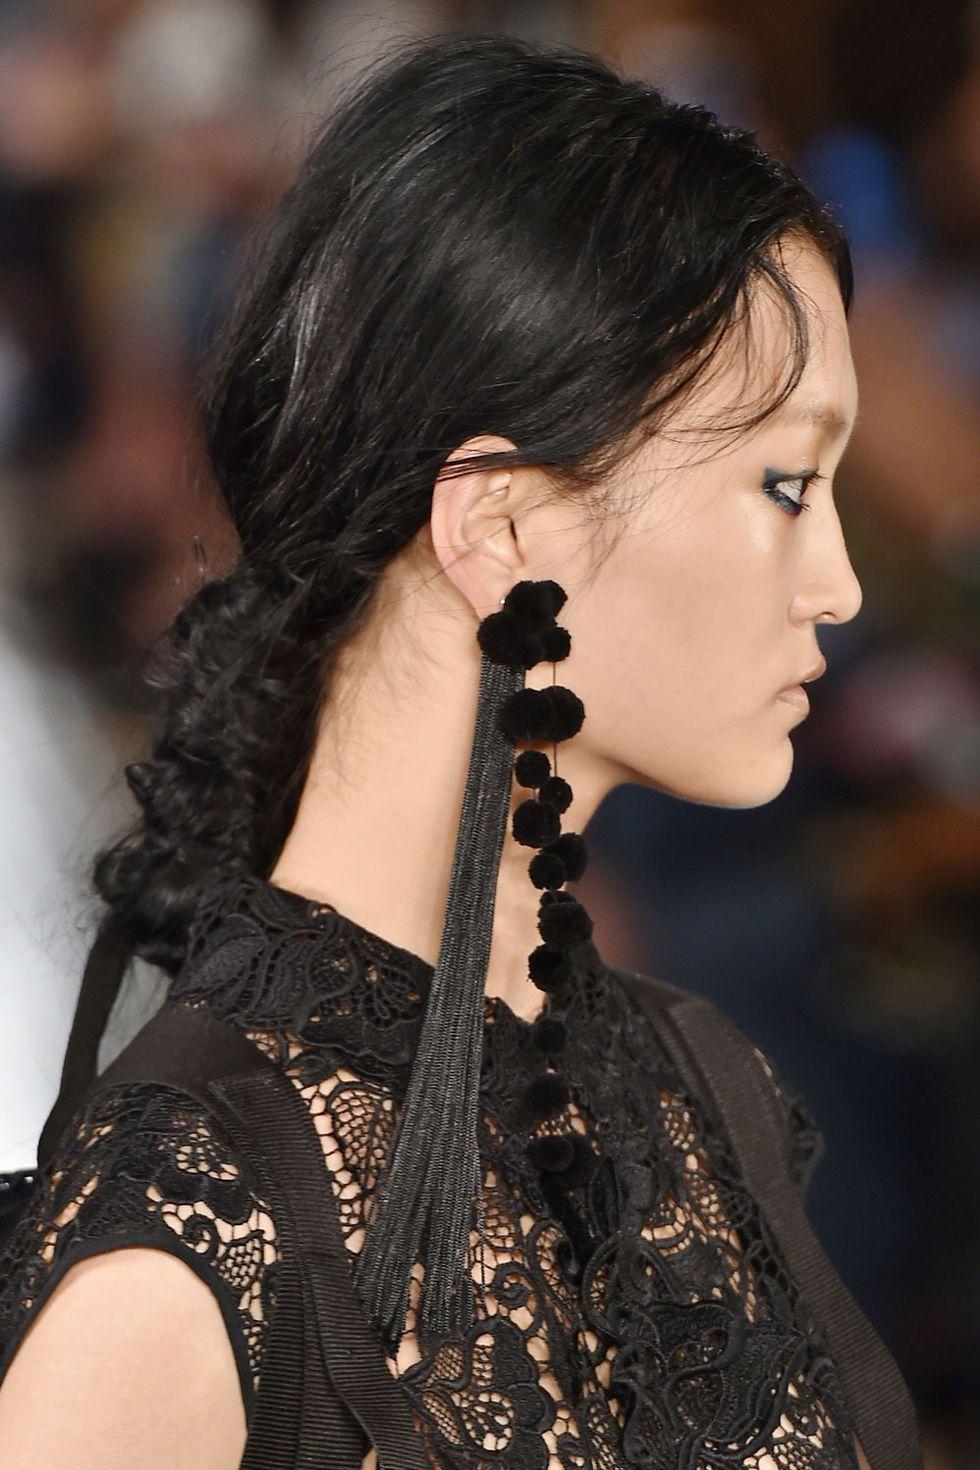 wedding-guest-hair-braid-style-beauty-twist-ponytail.jpg